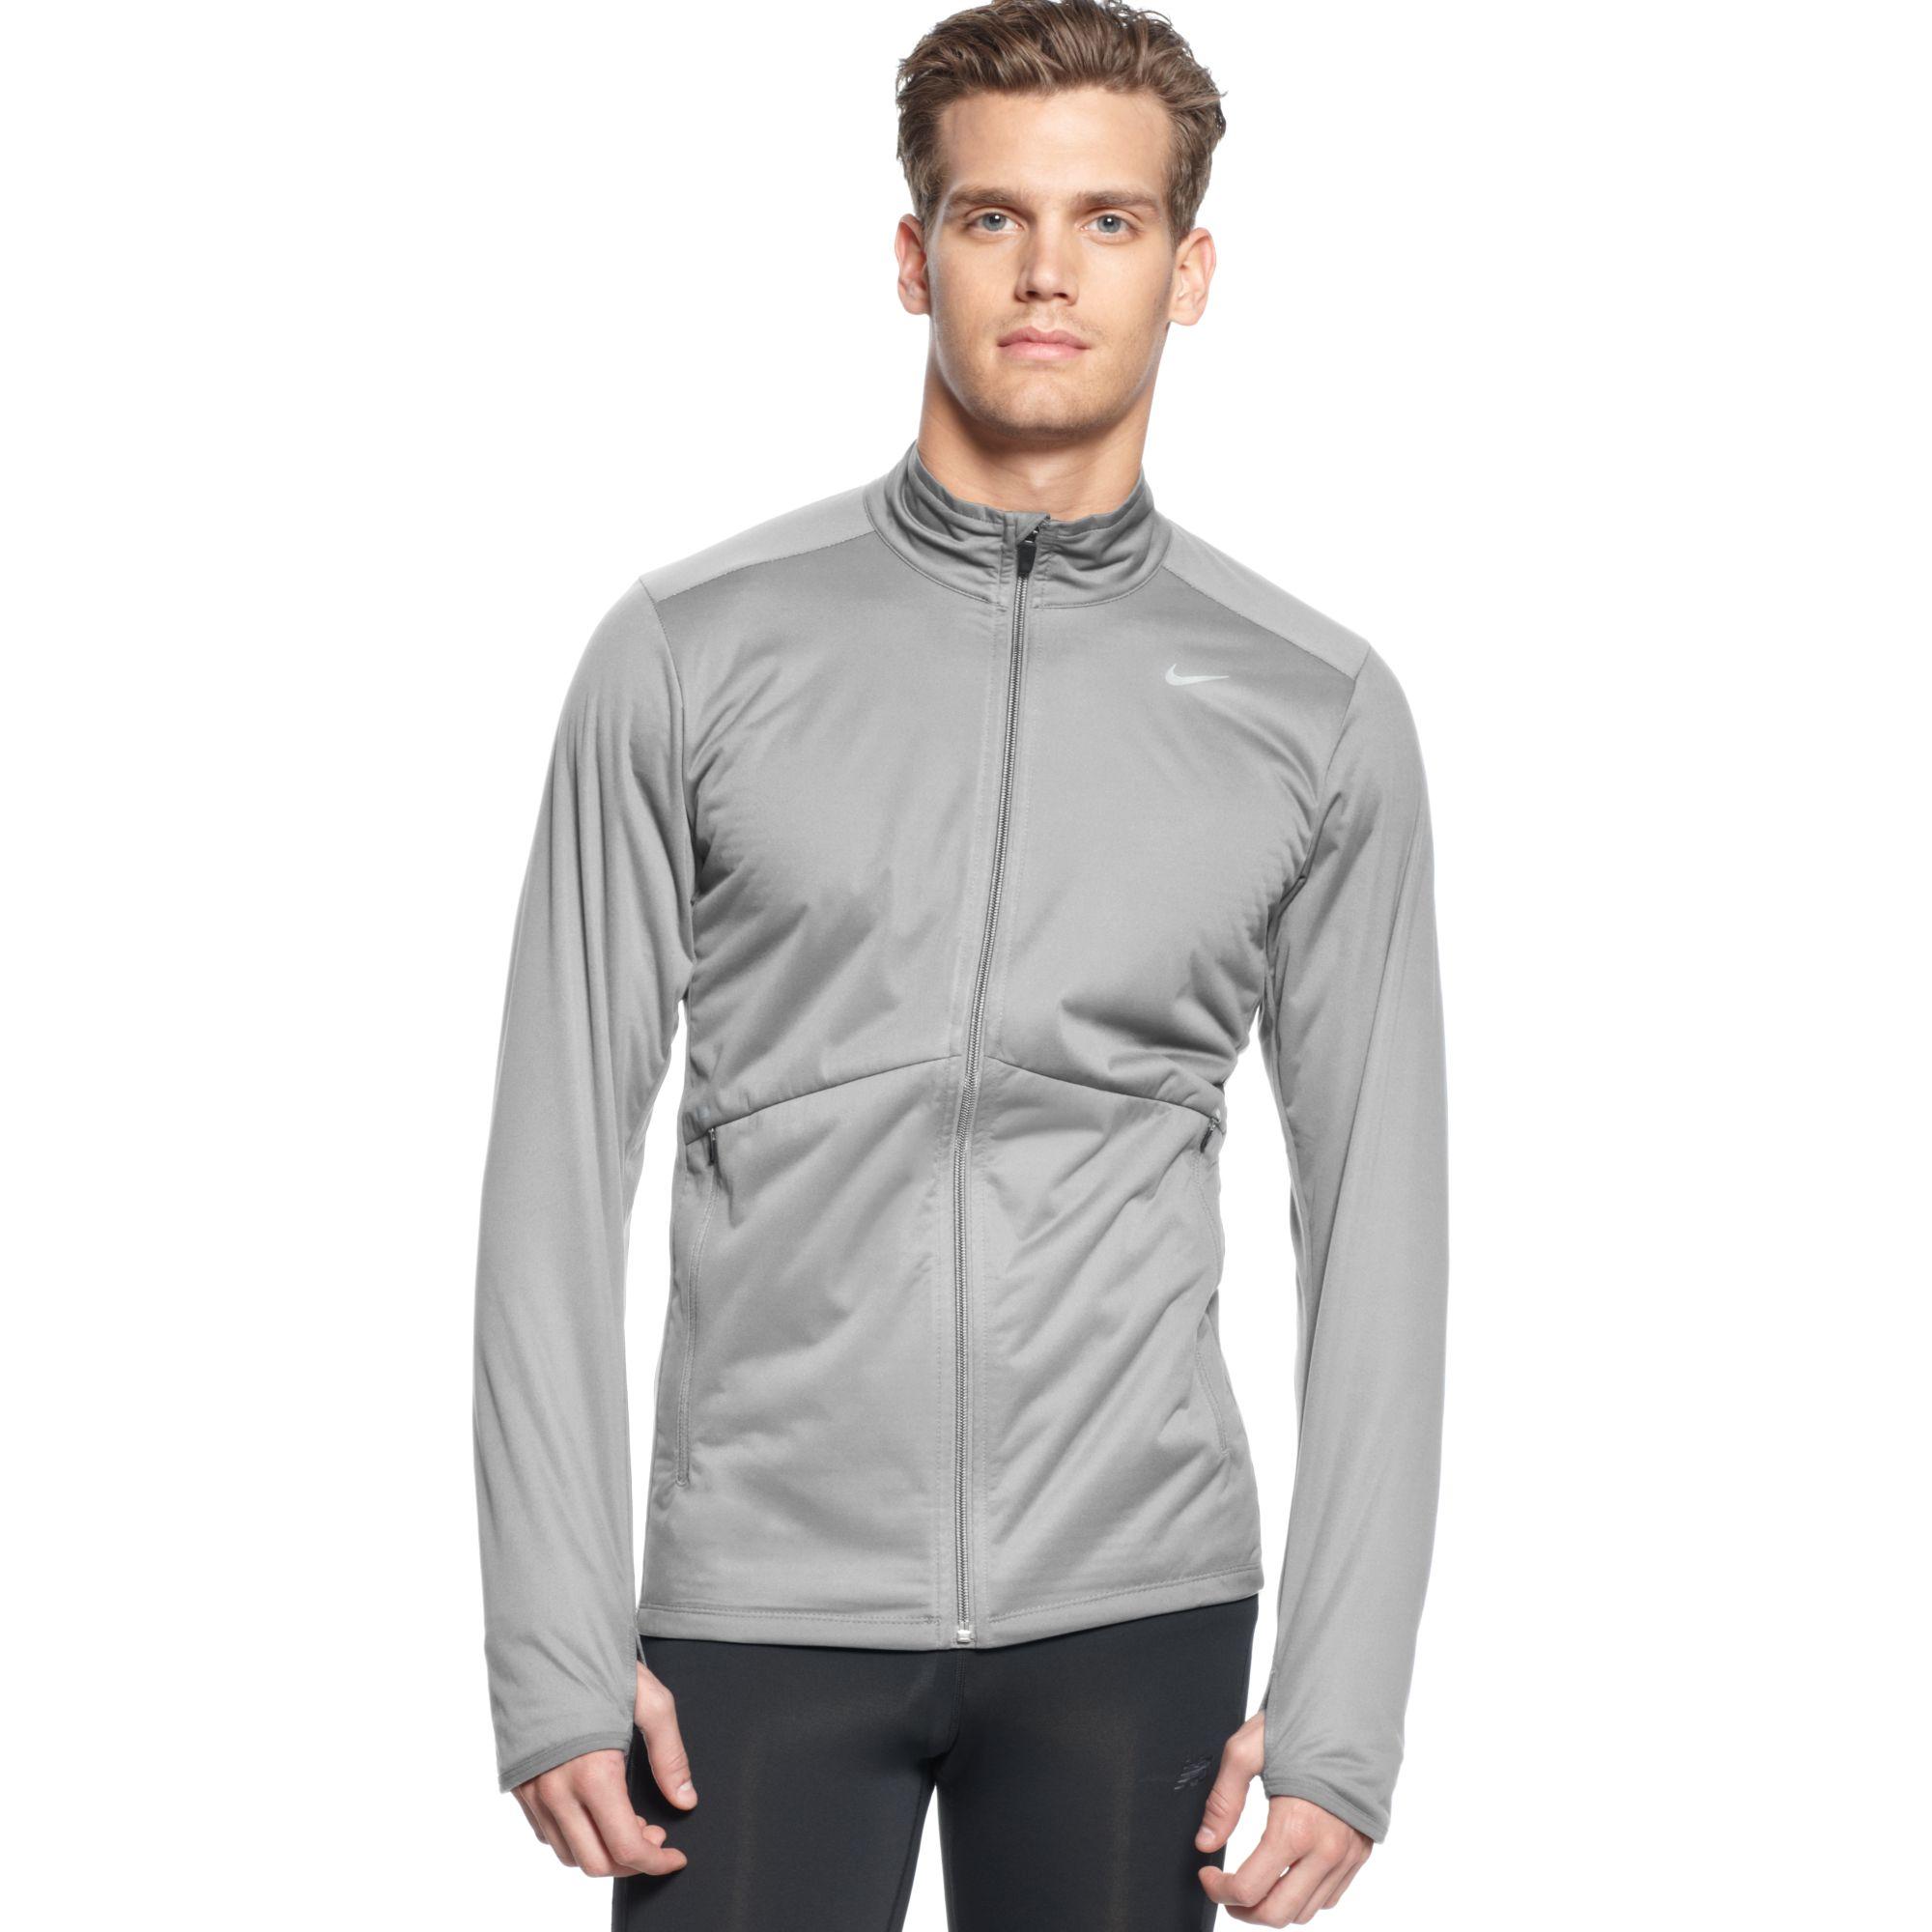 c25358679877 Lyst - Nike Element Shield Drifit Fullzip Running Jacket in Gray for Men